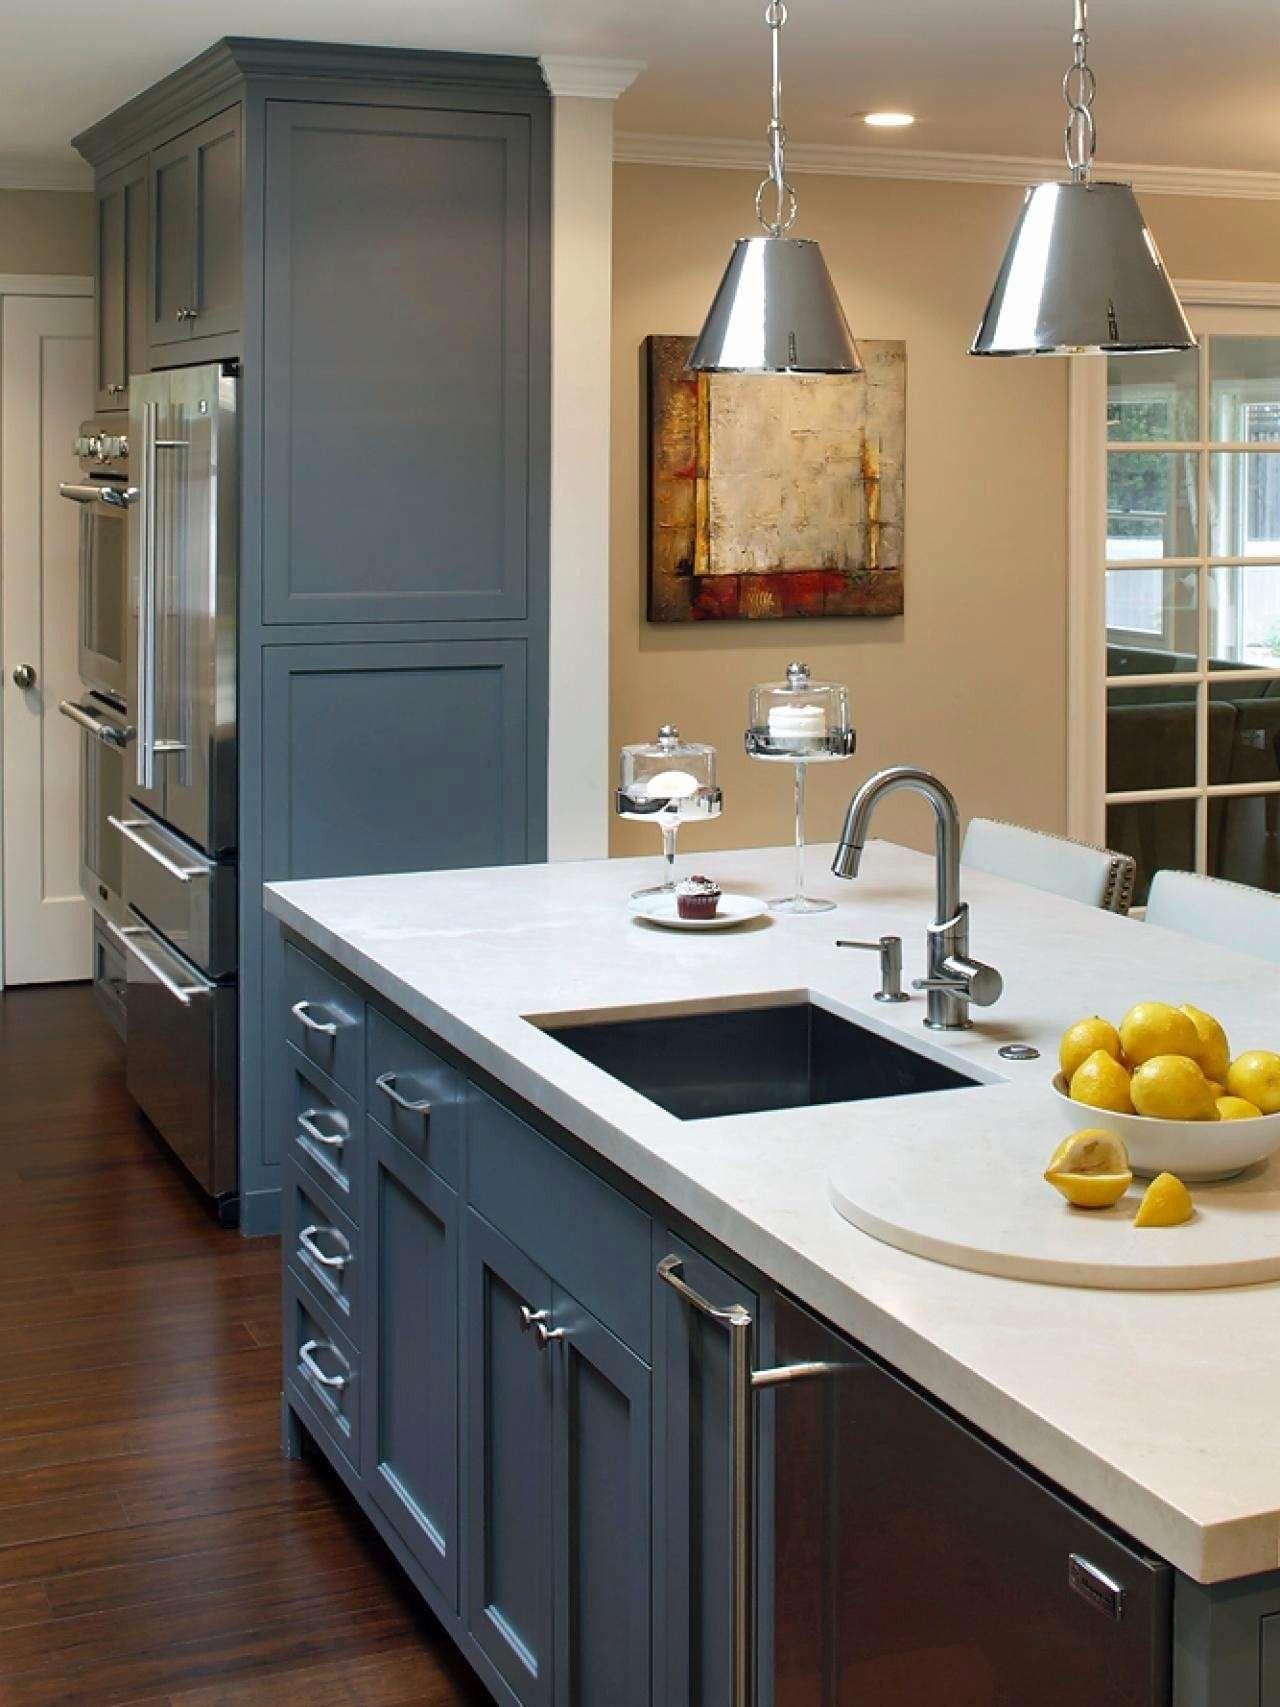 Inspirational Kitchen Cabinet Jackson   Kitchen island ...